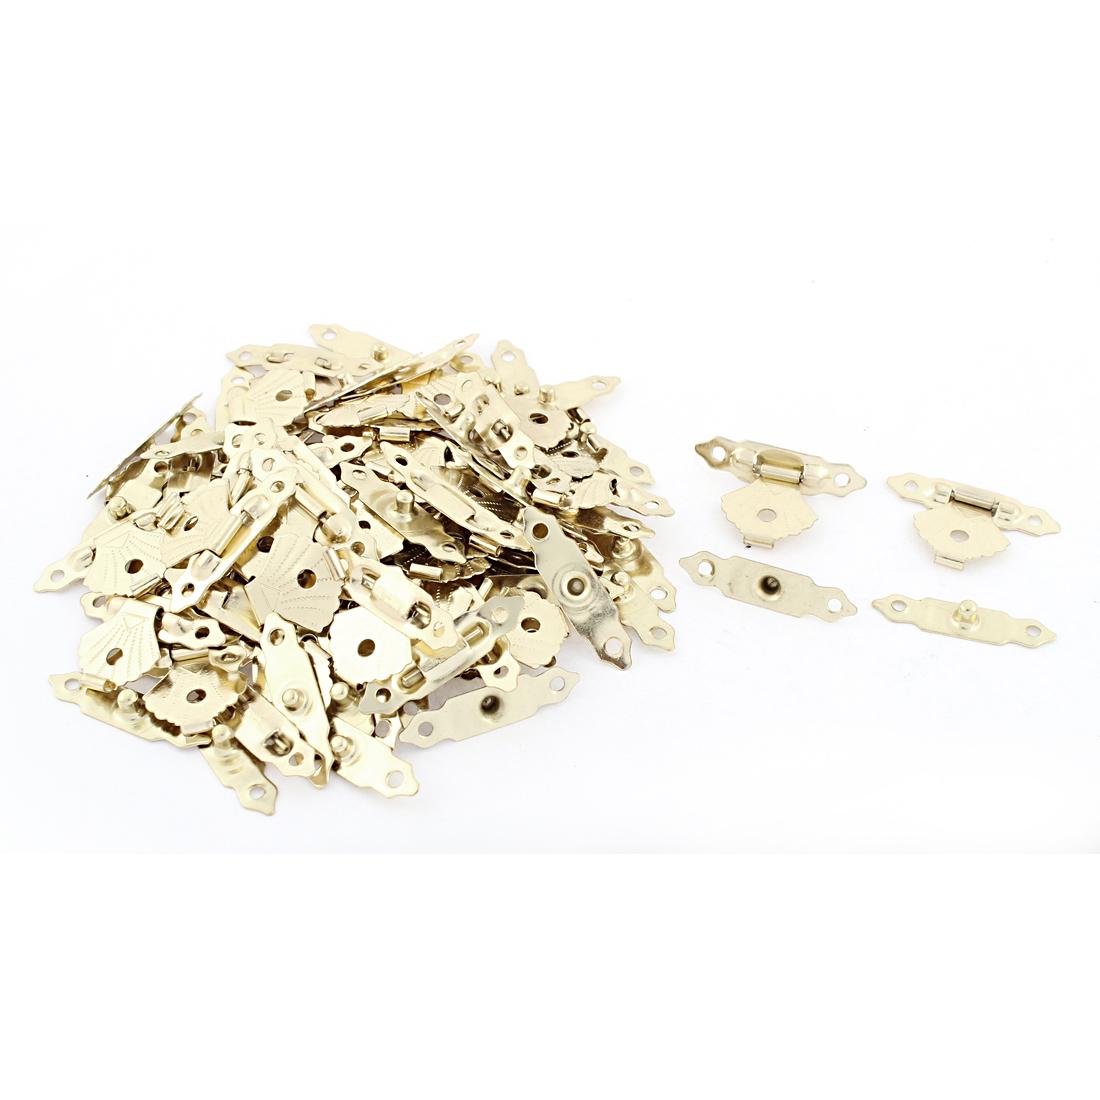 Jewelry Case Gold Tone Flower Box Latch Catch Decoration 50 Pcs